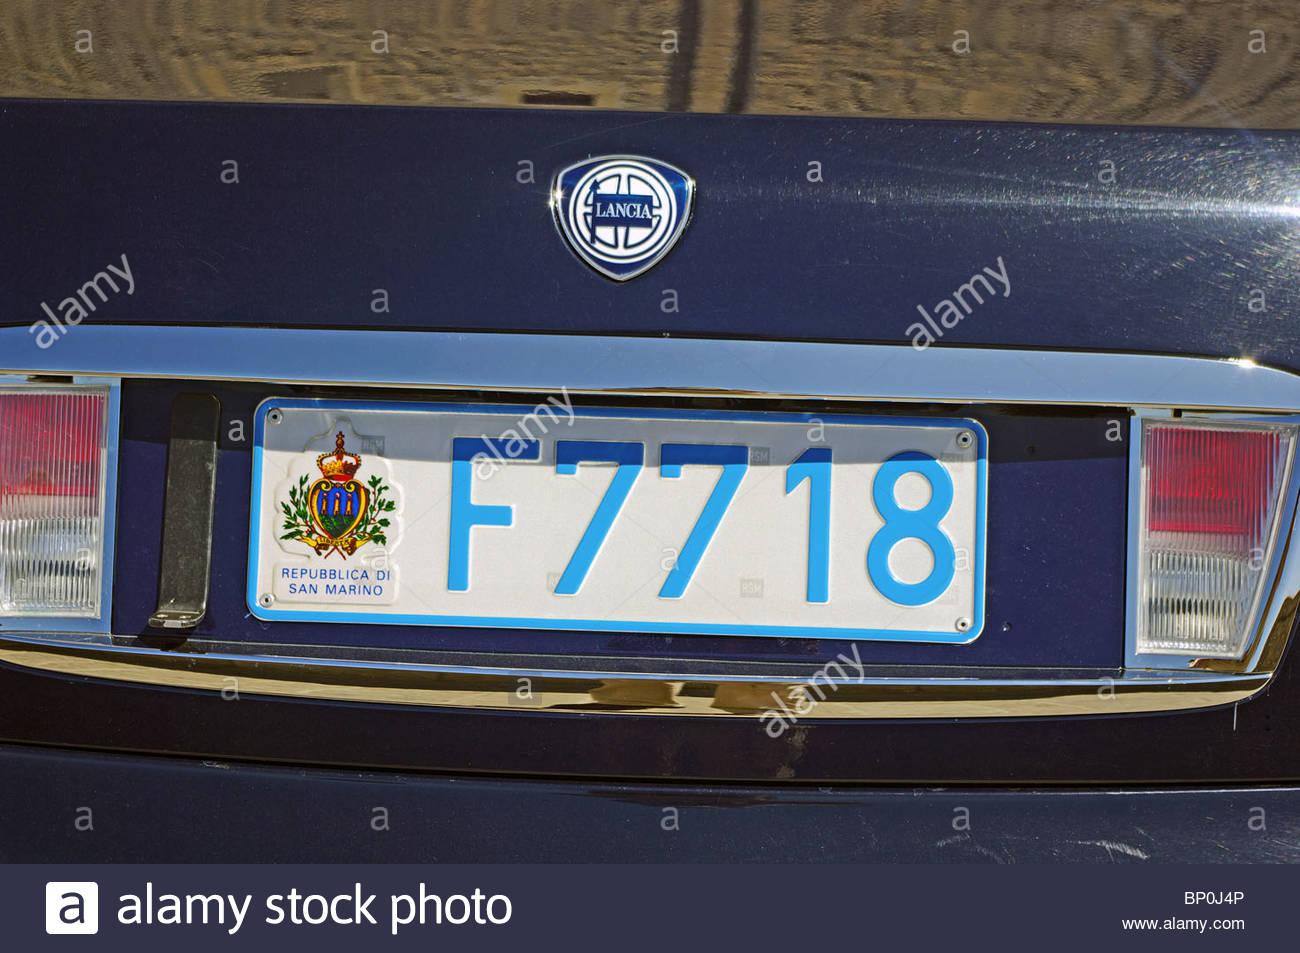 Car Number Plate San Marino City Europe Stock Photo 30747046 Alamy